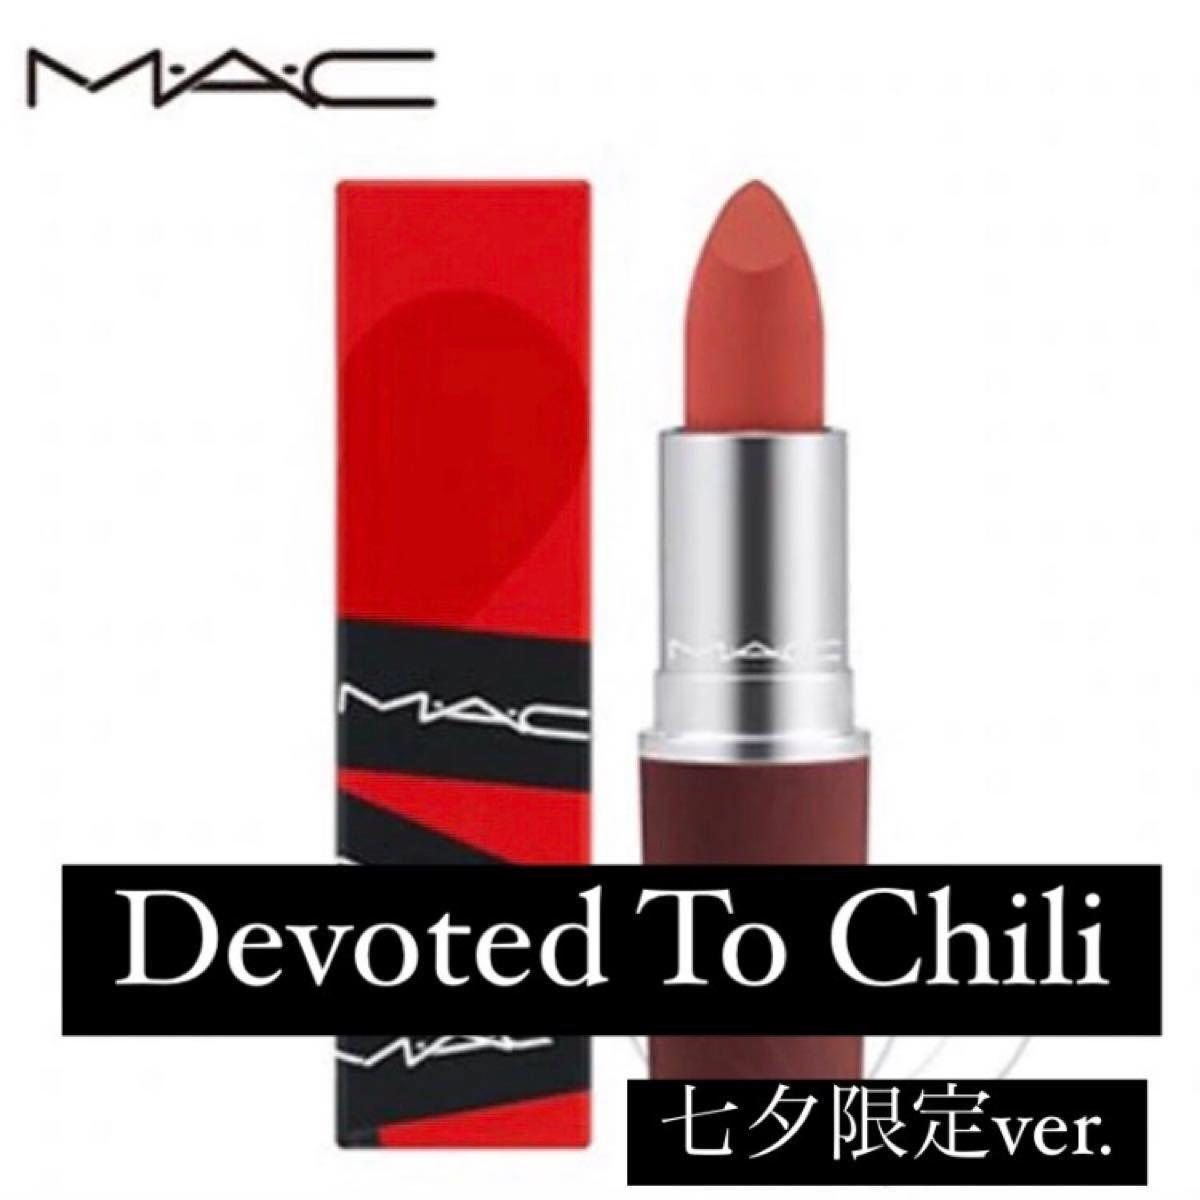 MAC/【Devoted To Chili】パウダーキス  リップスティック マック  口紅